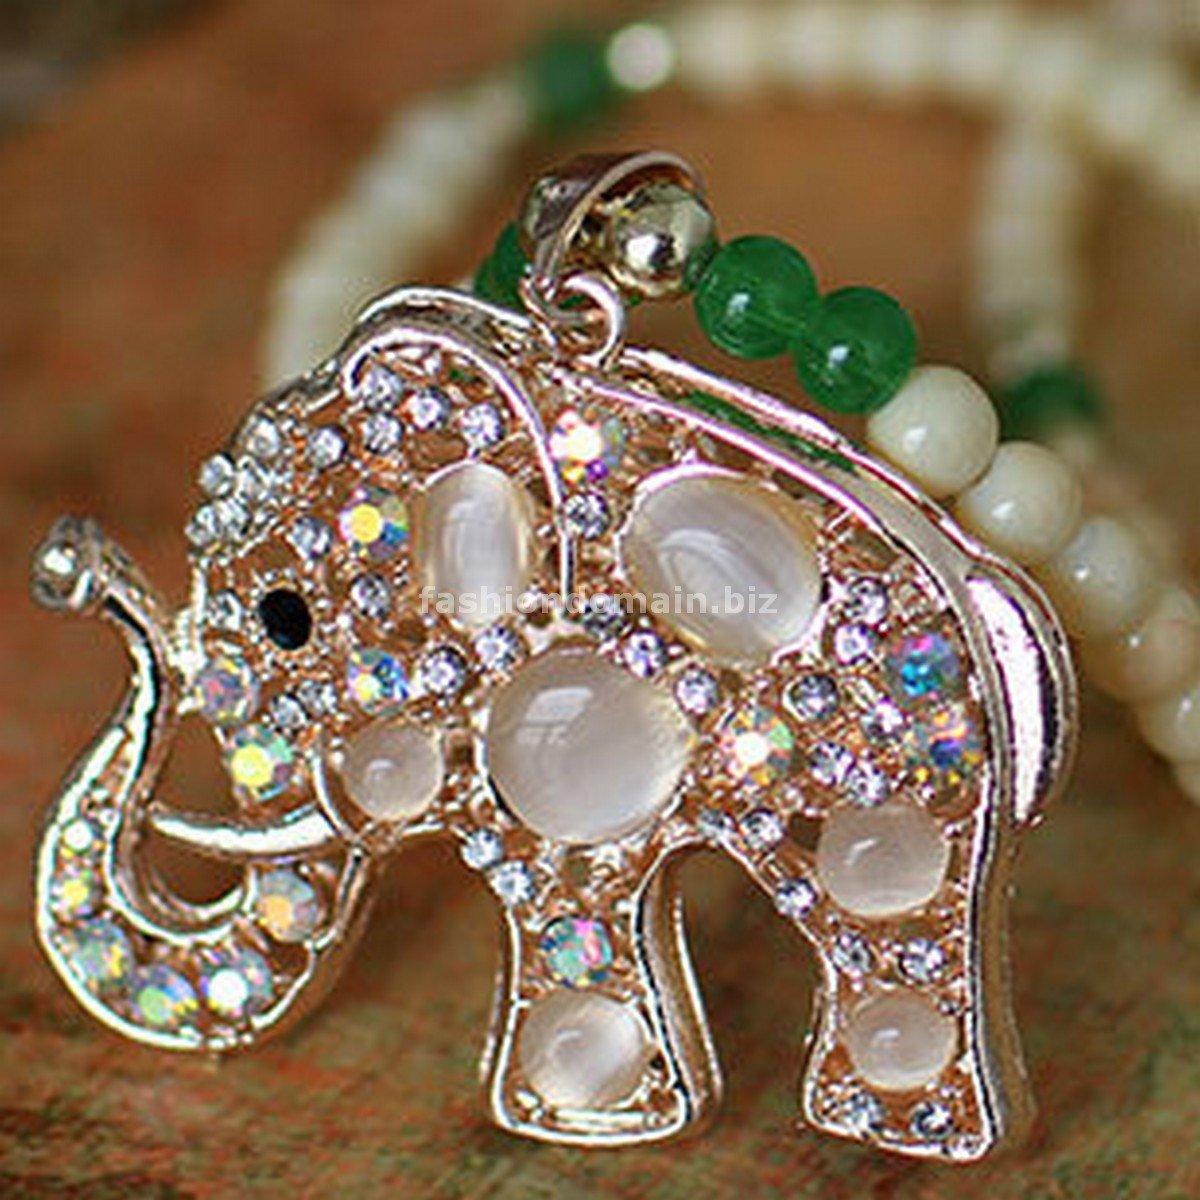 Buy High Quality Alloy plating Opal Green Agate Synthetic Tridacna Hollow Rhinestone Elephant Penda